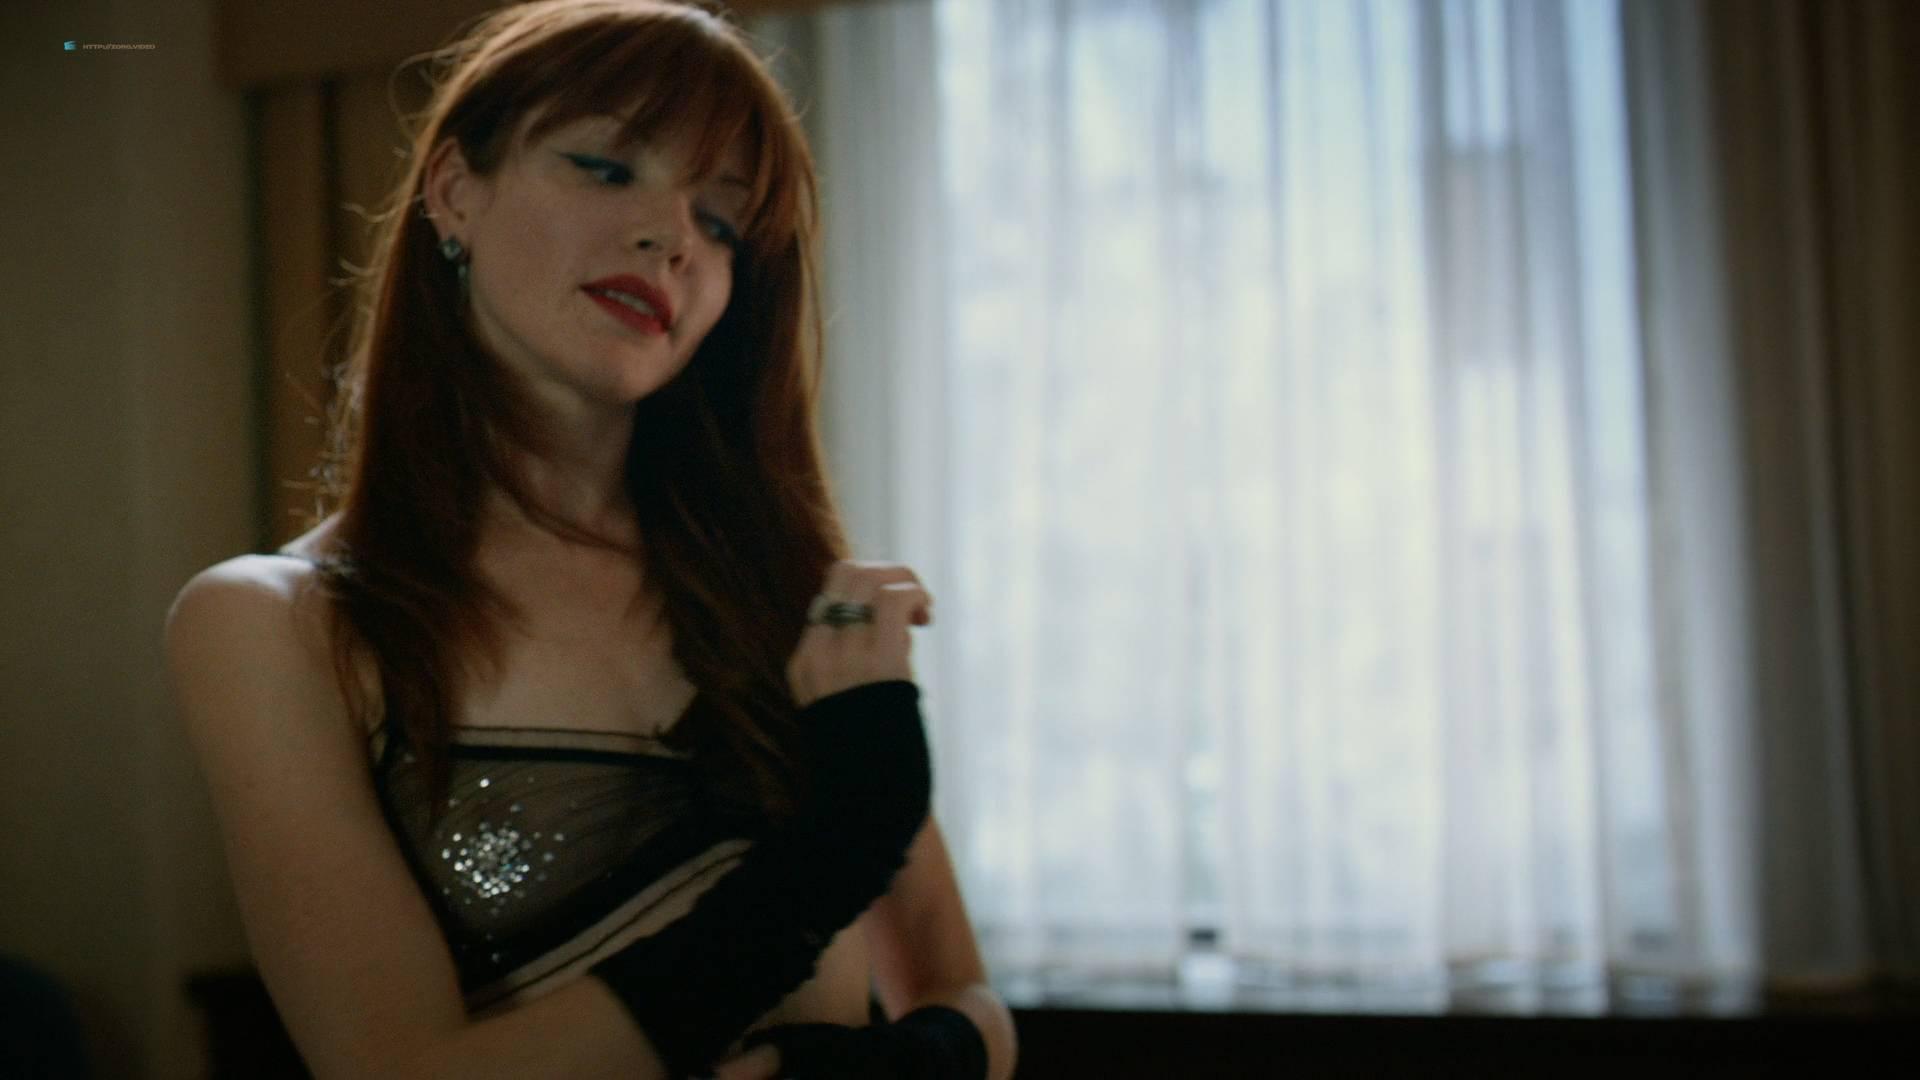 Nicole LaLiberte nude full frontal - Girls Against Boys (2013) HD 1080p BluRay (13)